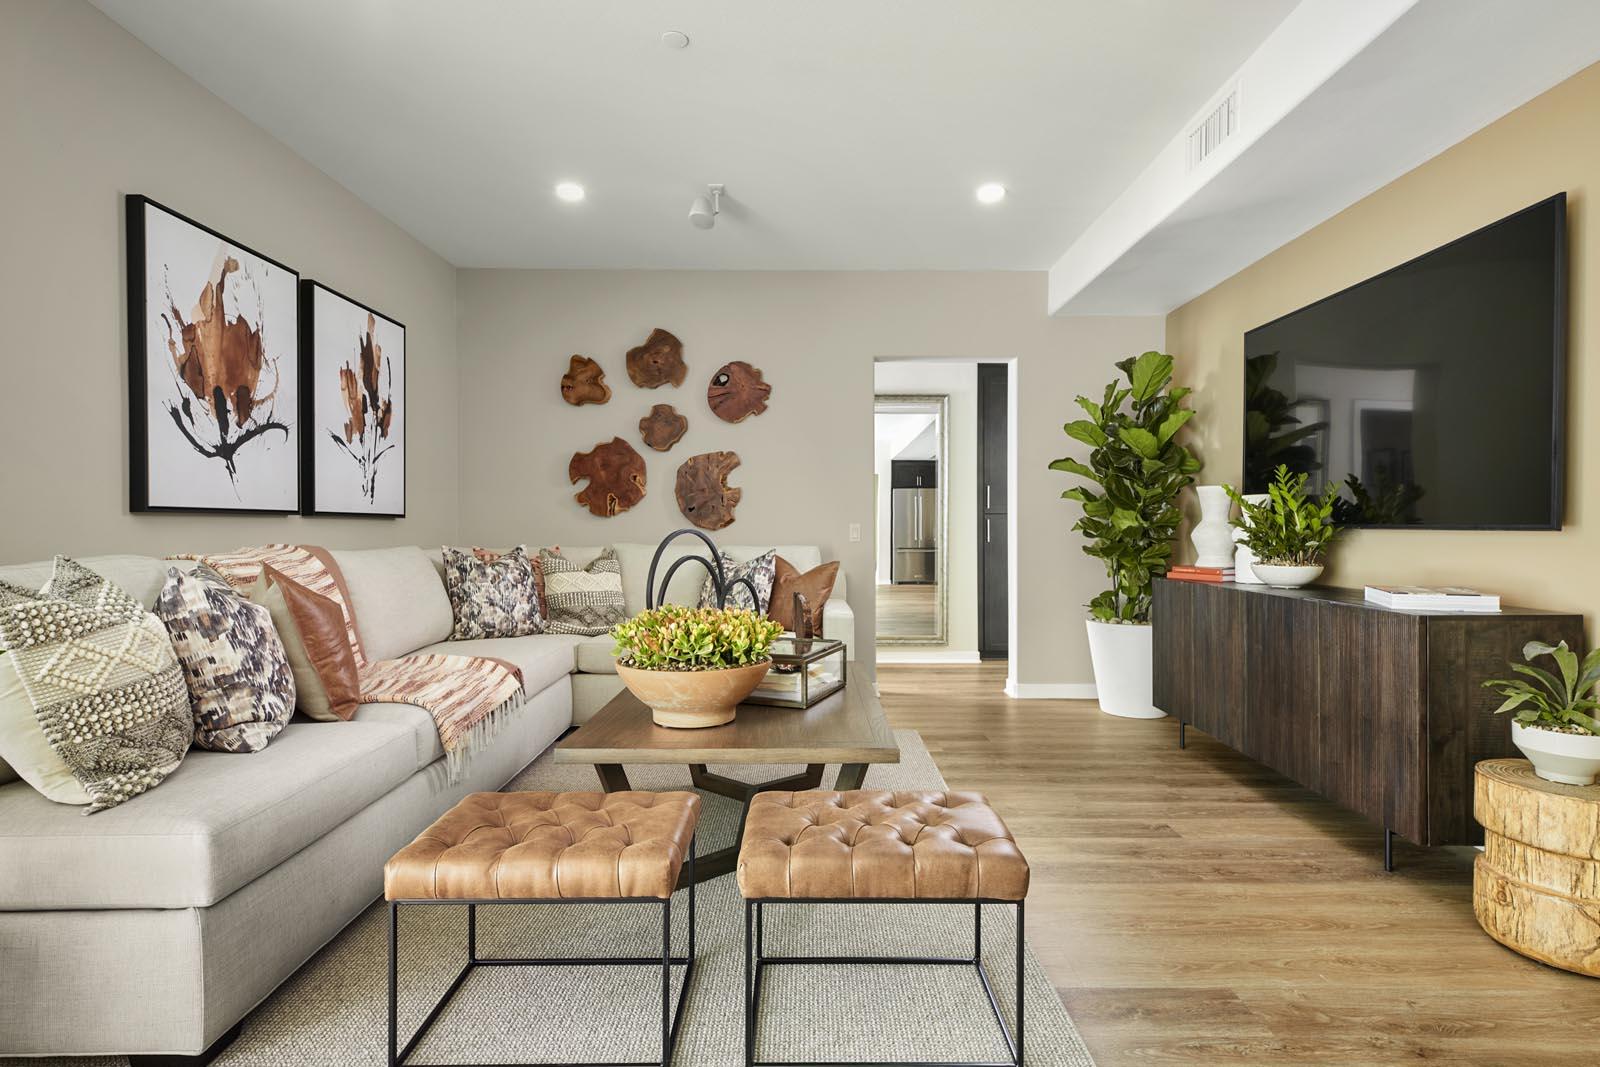 Great Room | Residence 5 | Aspire | New Homes in Rancho Cucamonga, CA | Van Daele Homes